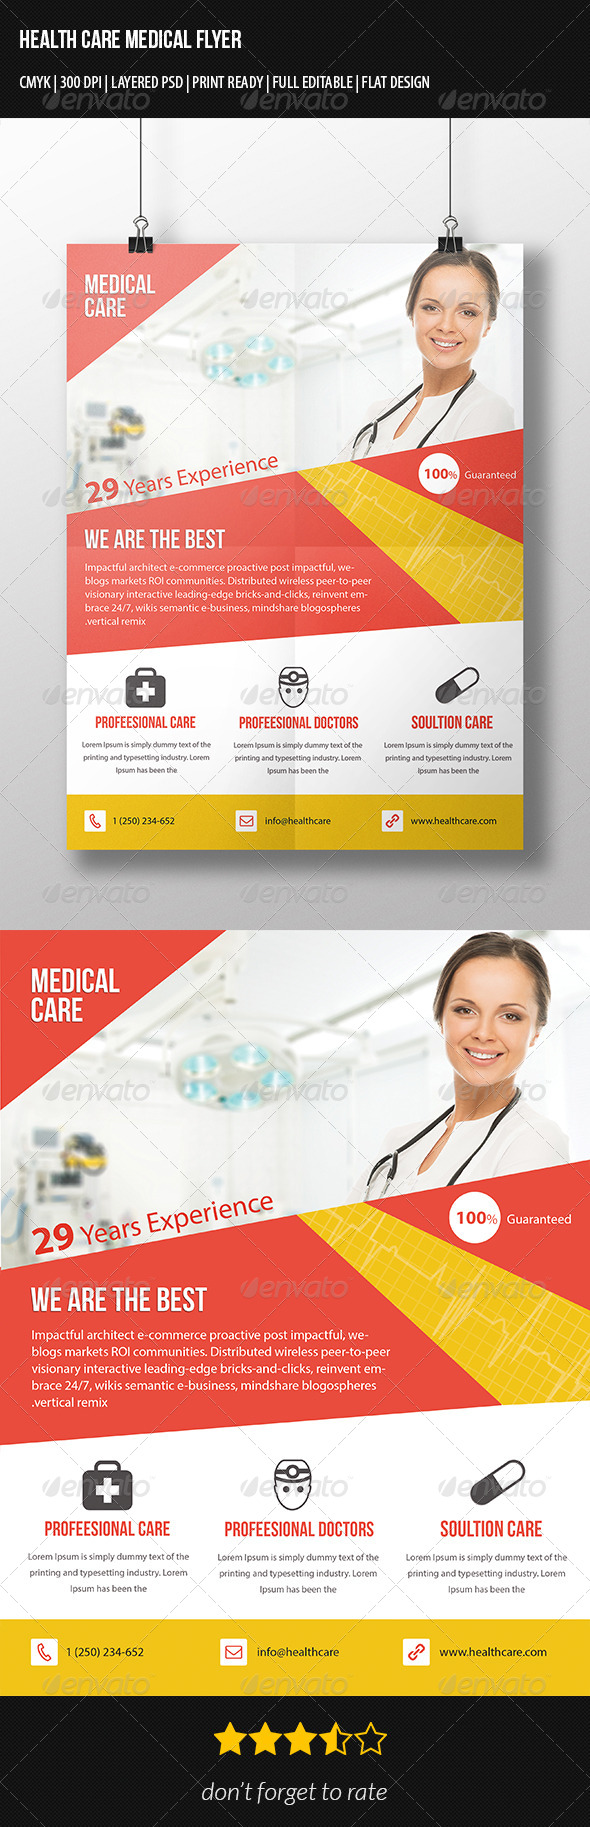 Corporate Health Care Flyer - Corporate Flyers